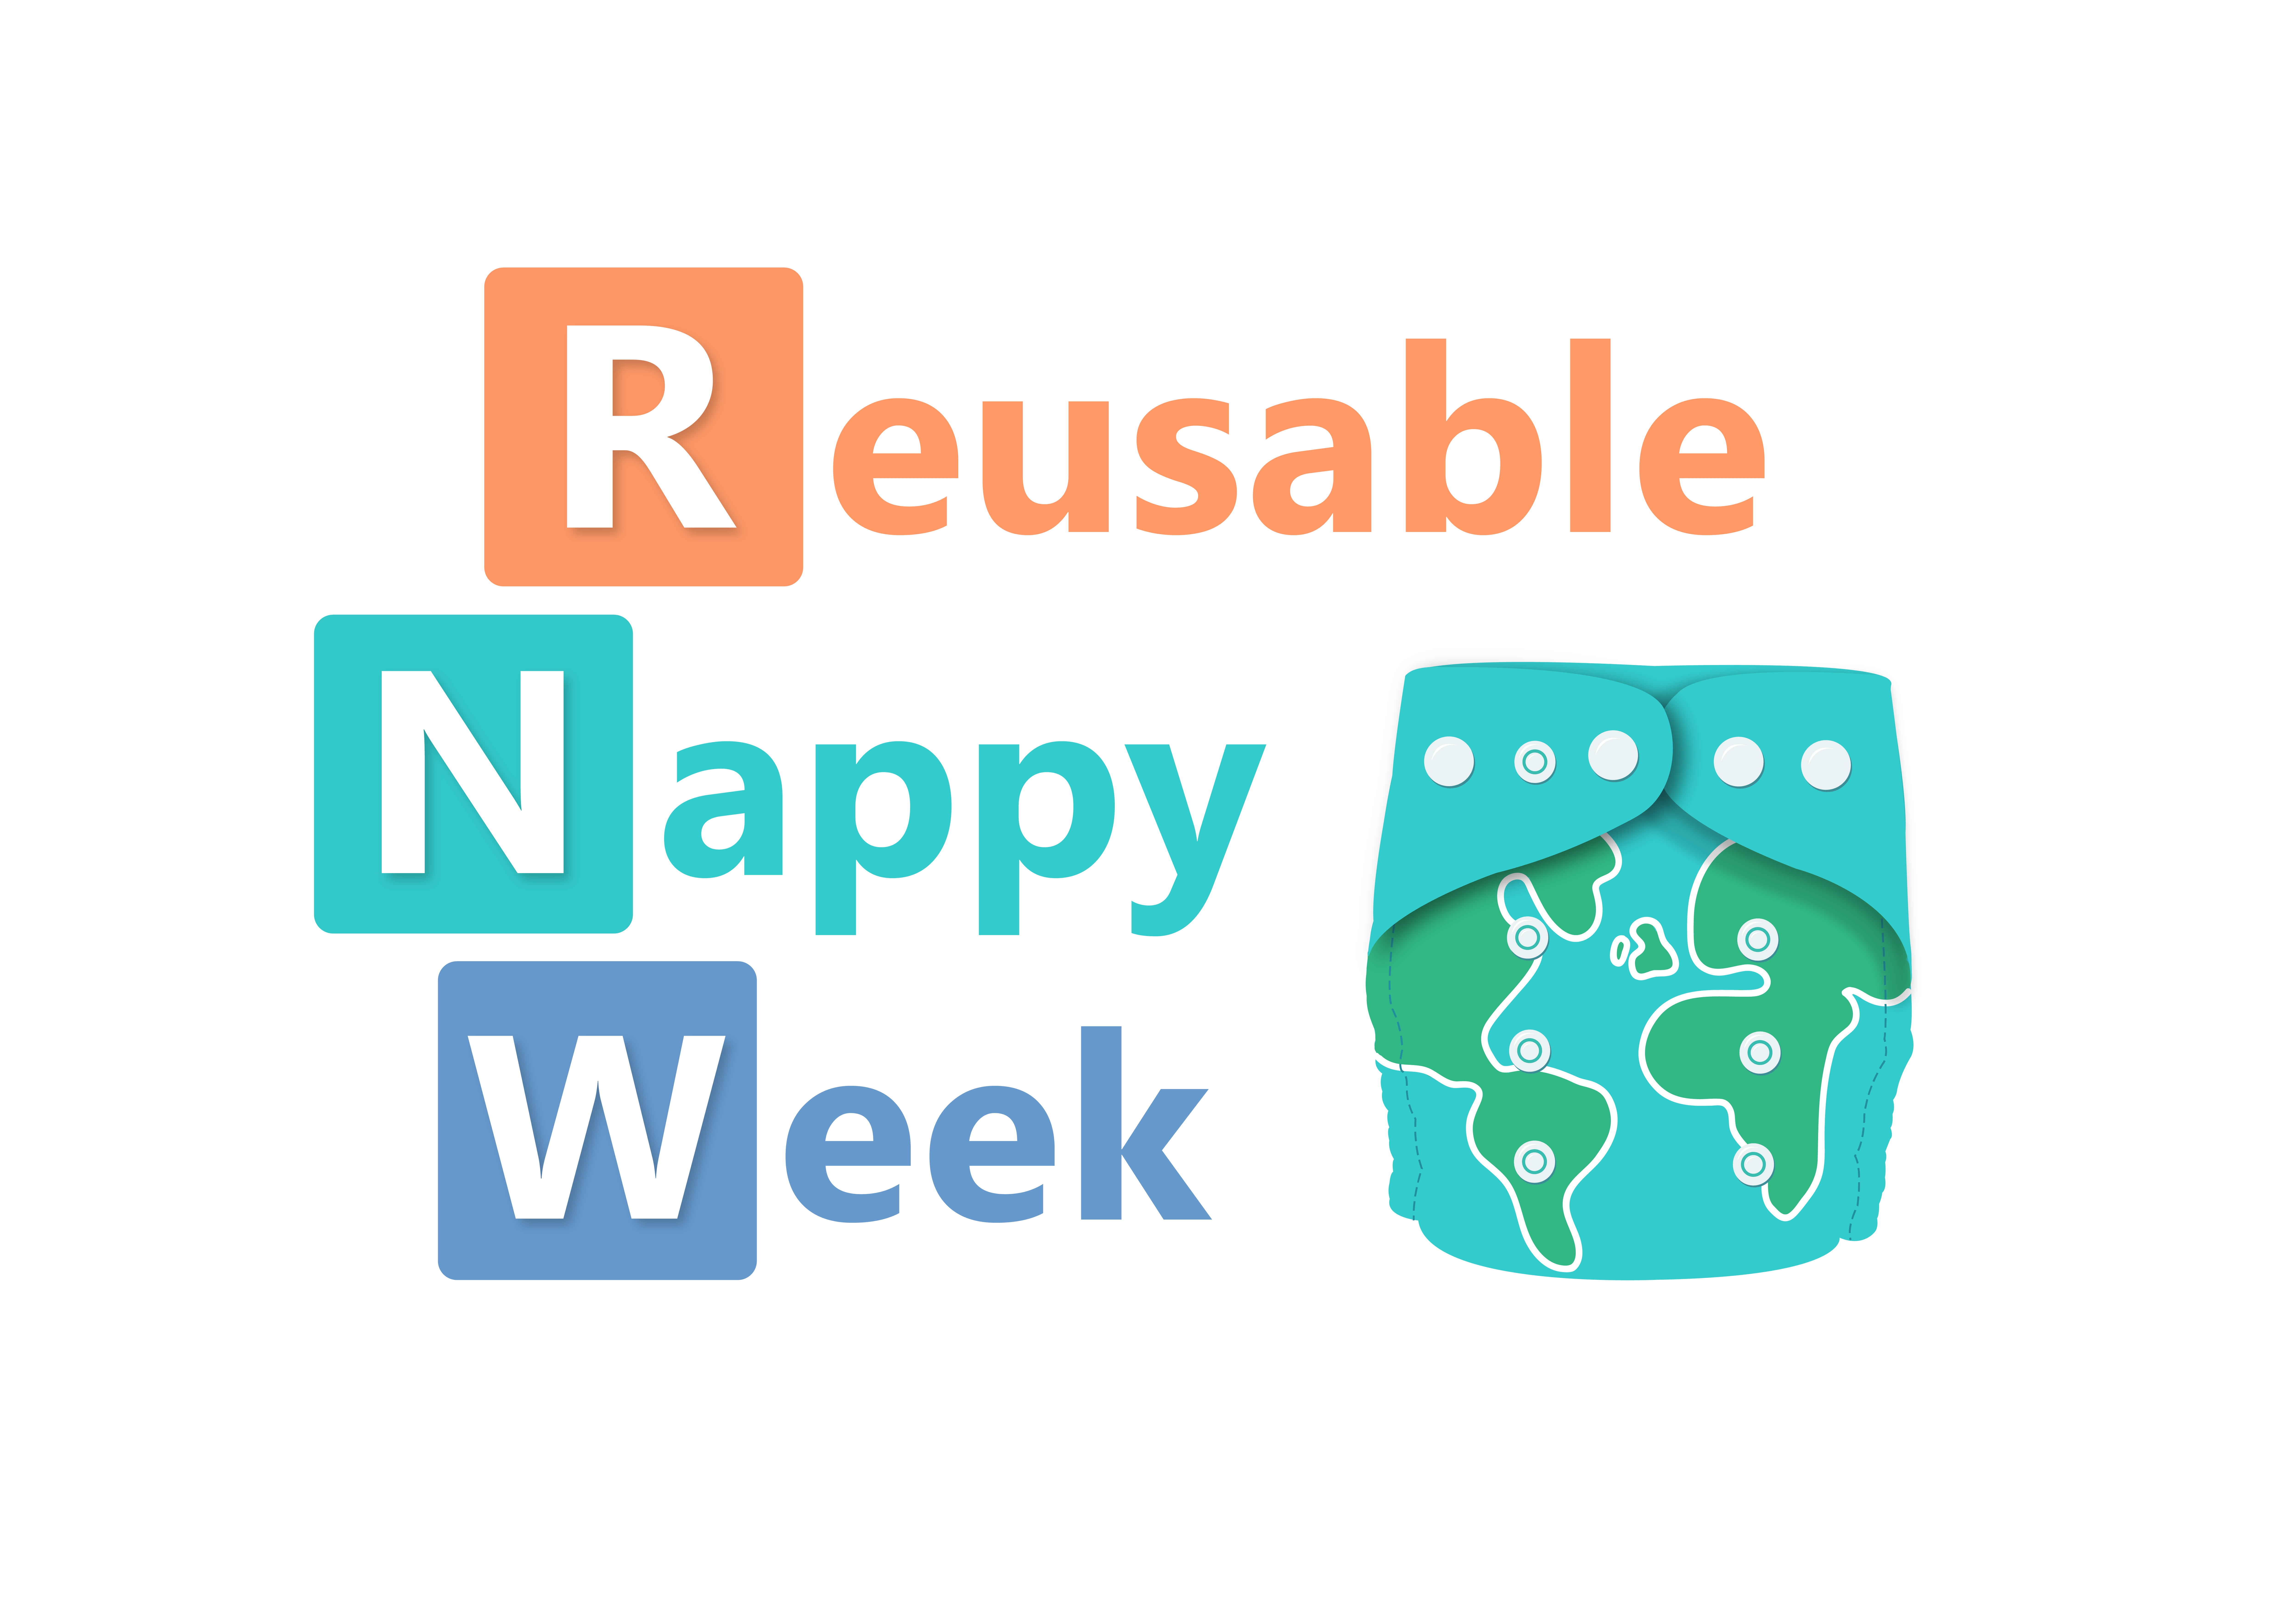 Reusable Nappy Week